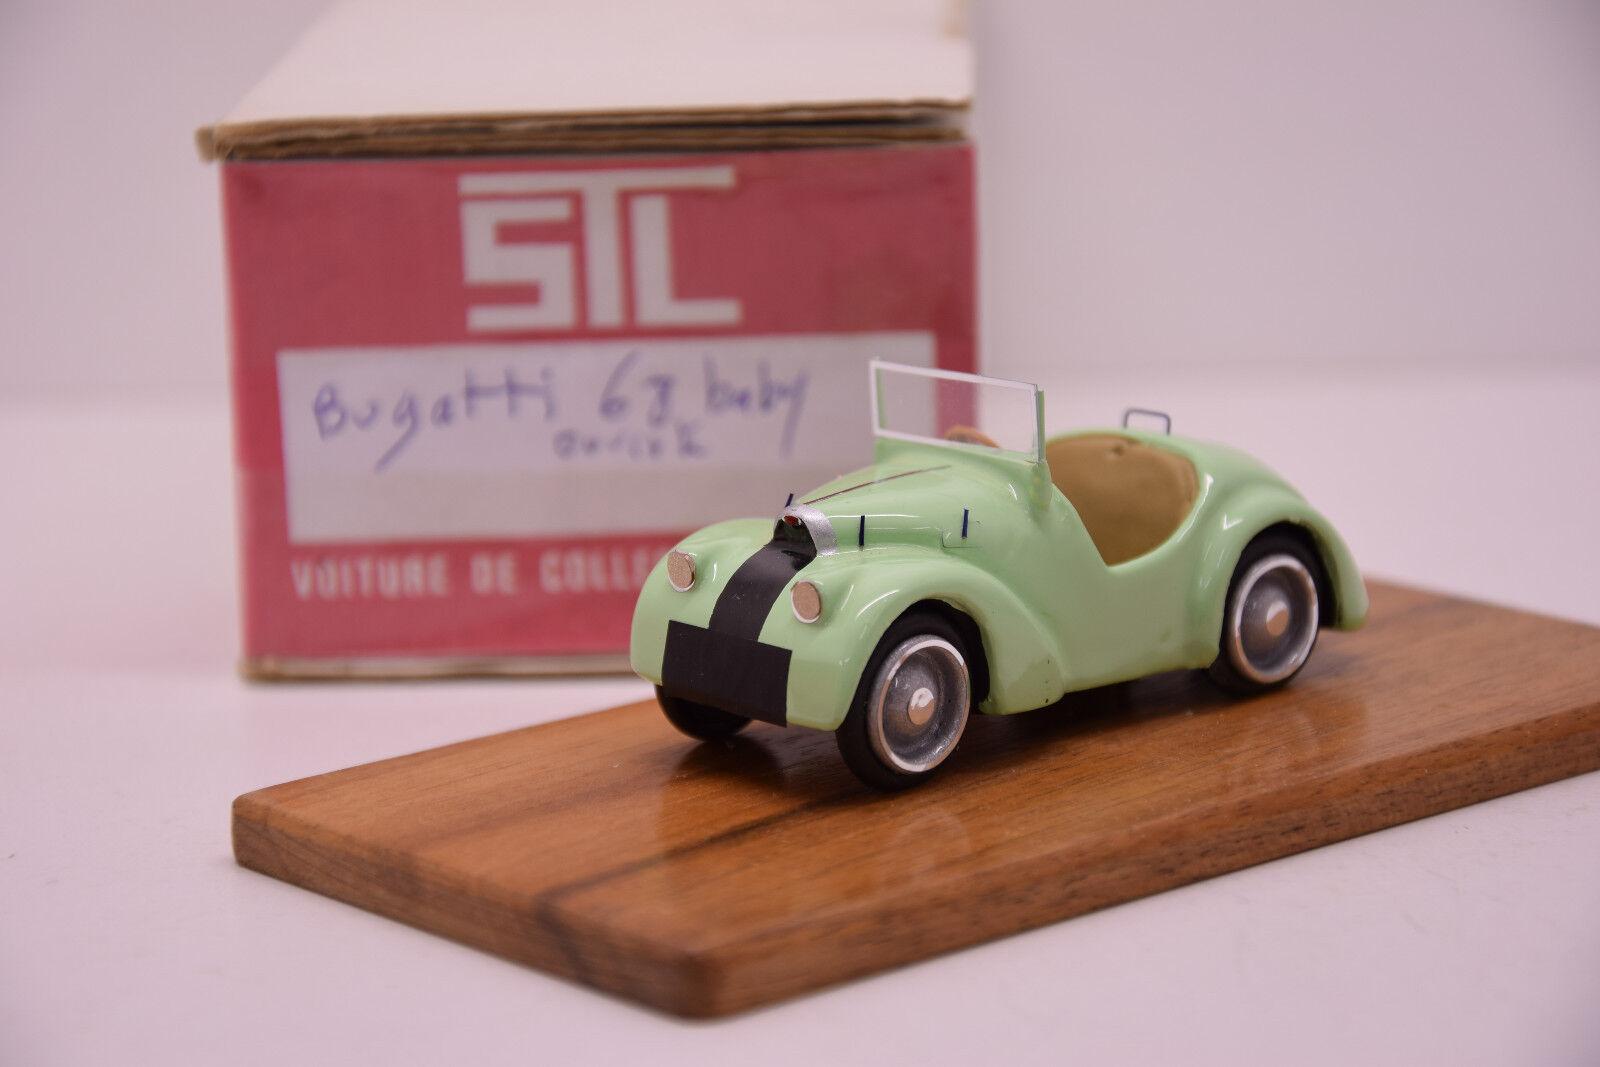 BUGATTI 68 BABY OUverdeE verde CLAIR STL 1 43 MONTAGE USINE